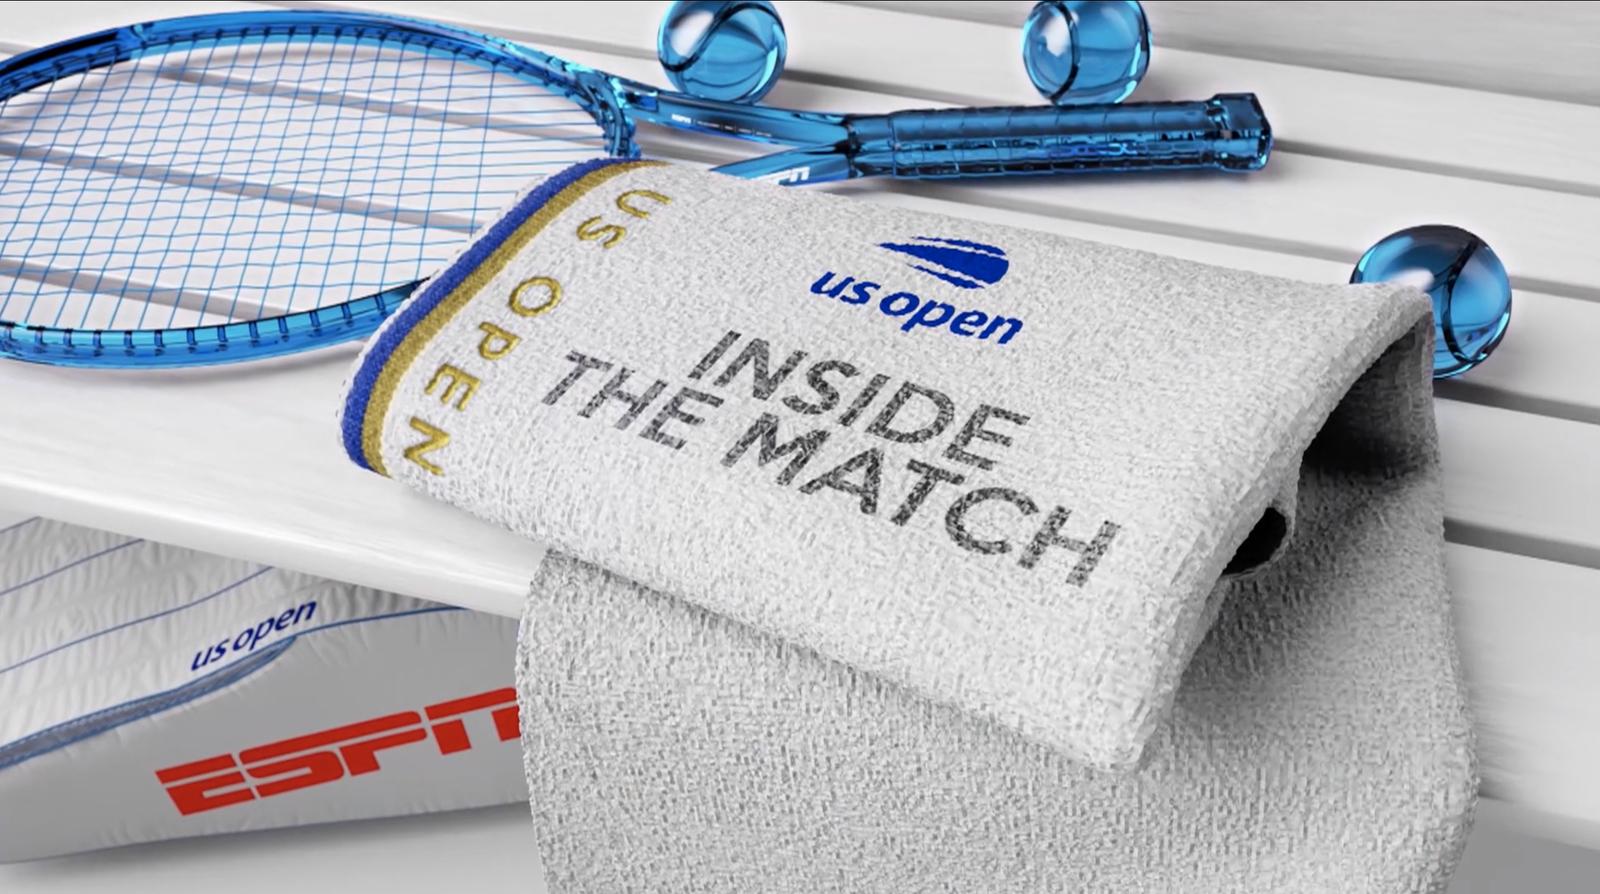 NCS_US-Open_ESPN-Broadcast-Design_013